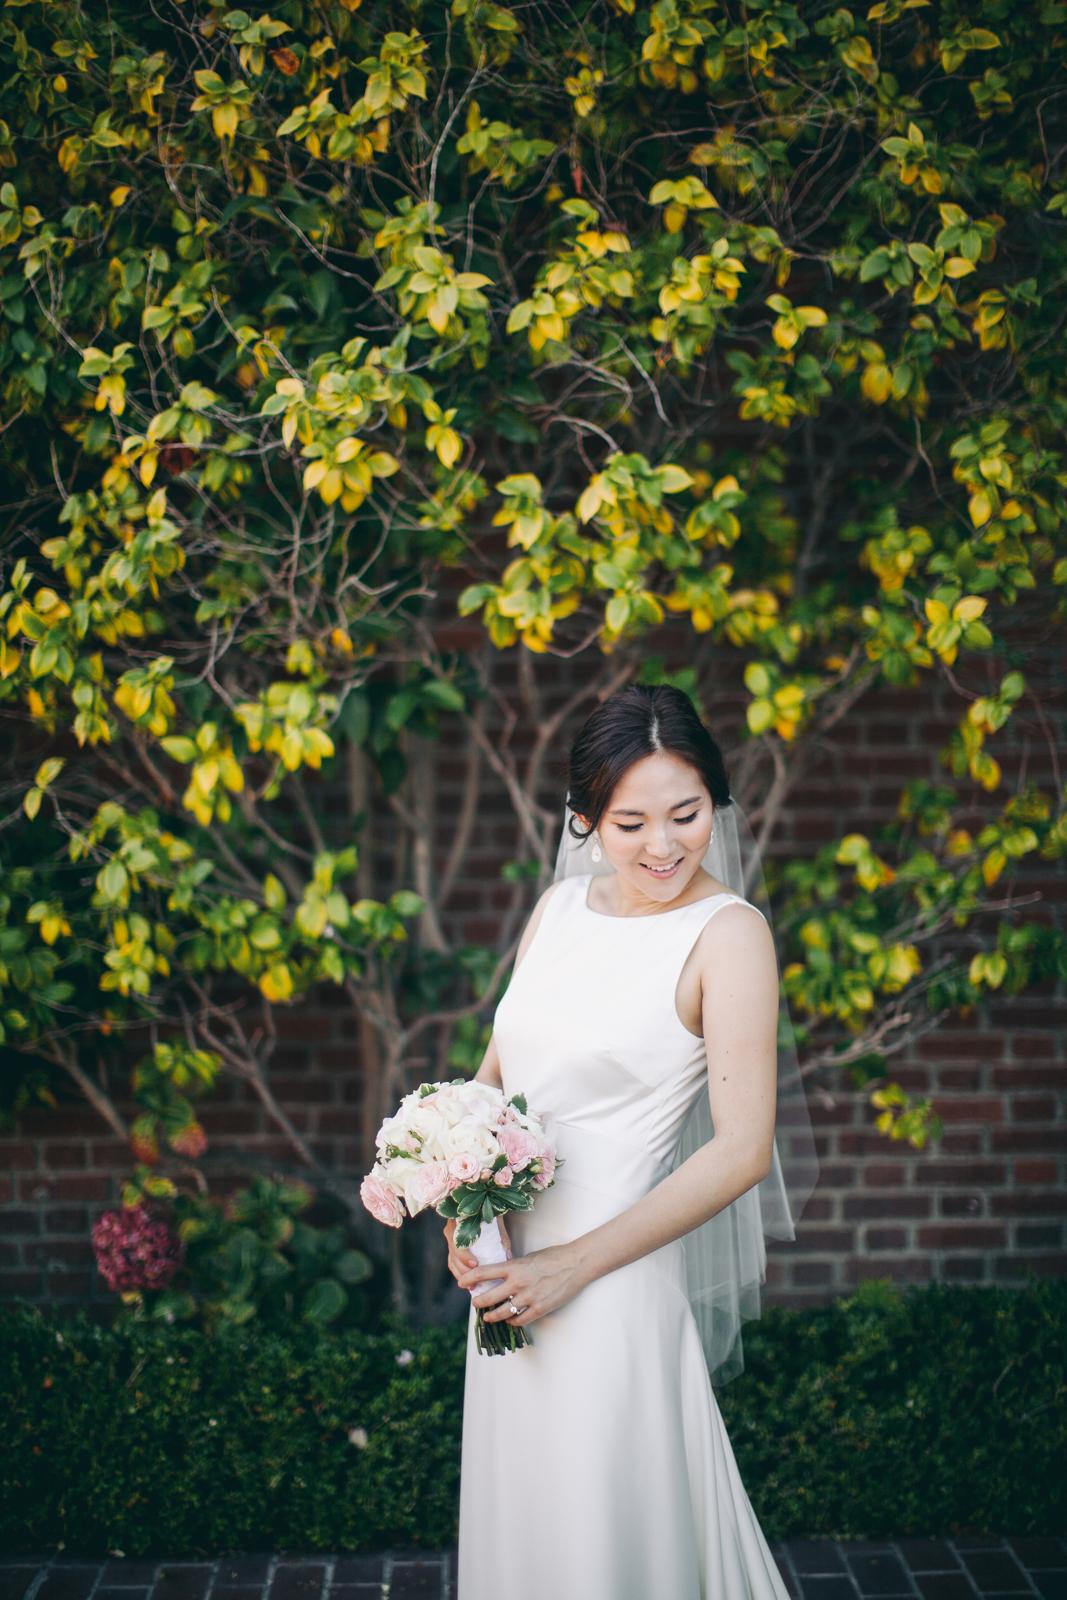 kohl_manison_wedding_photography_sarah_eric_ebony_siovhan_bokeh_photography_035.jpg